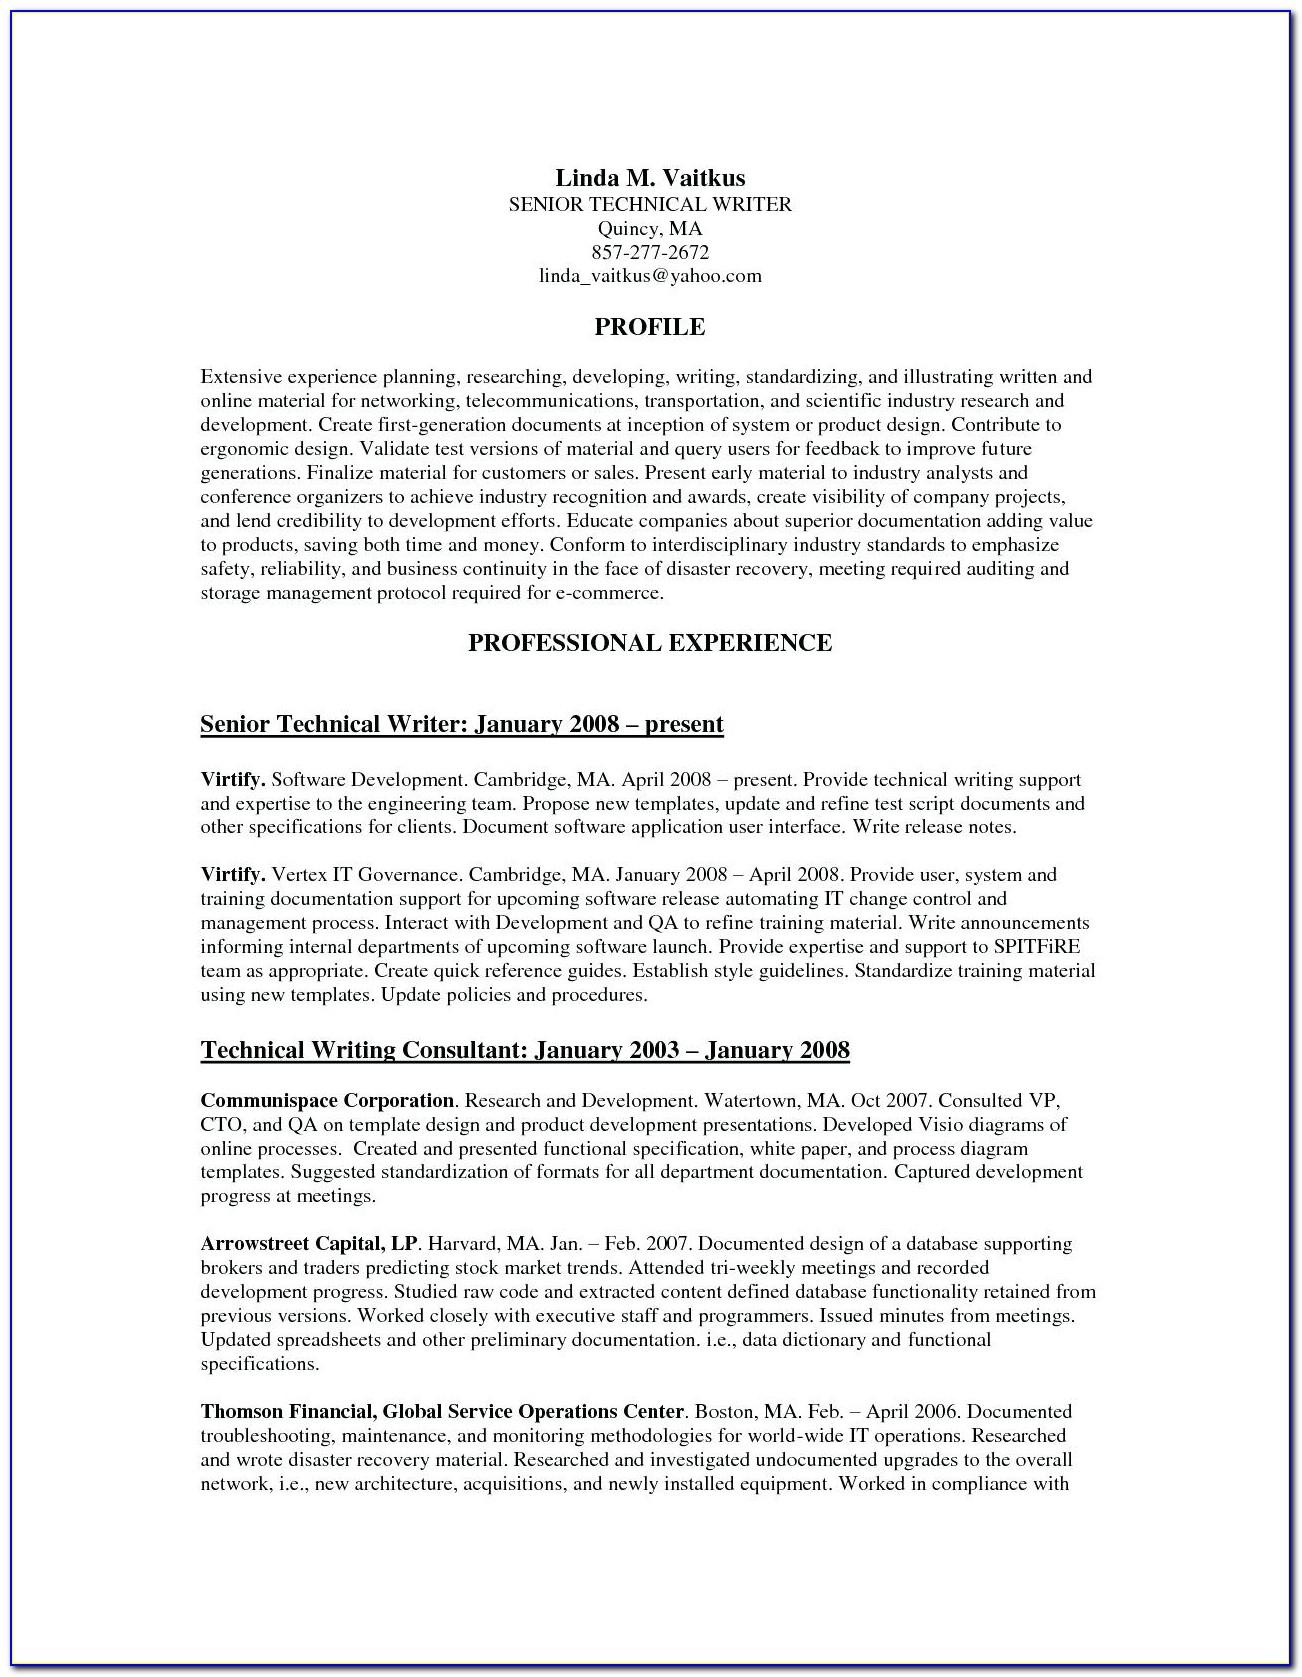 Professional Resume Services Austin Tx